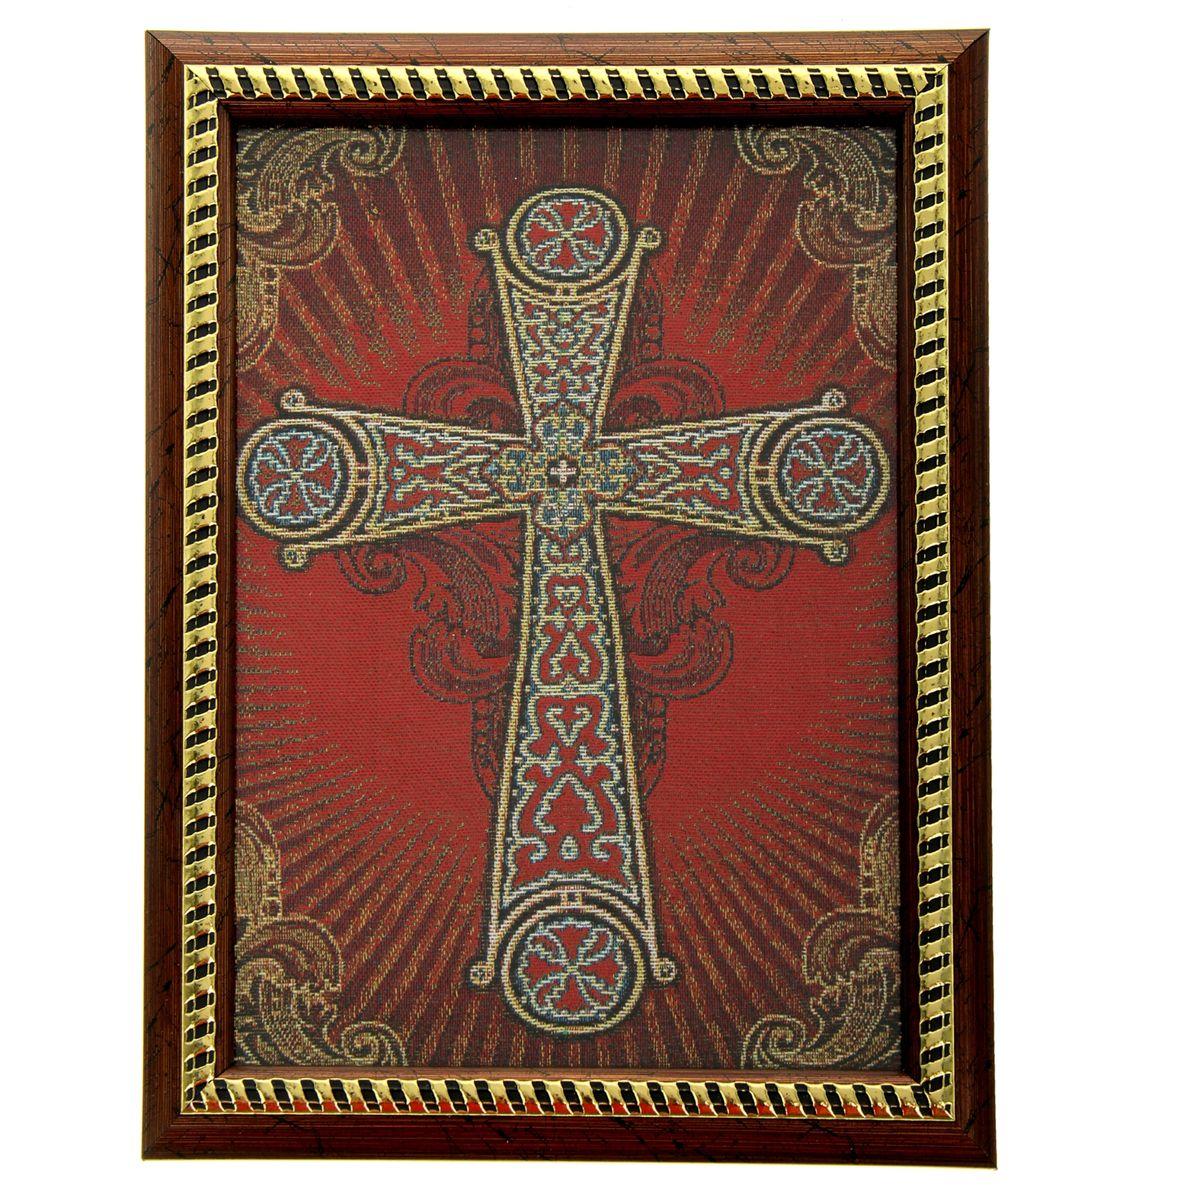 Икона в рамке Корсунский крест, 21 см х 27,5 см икона navell